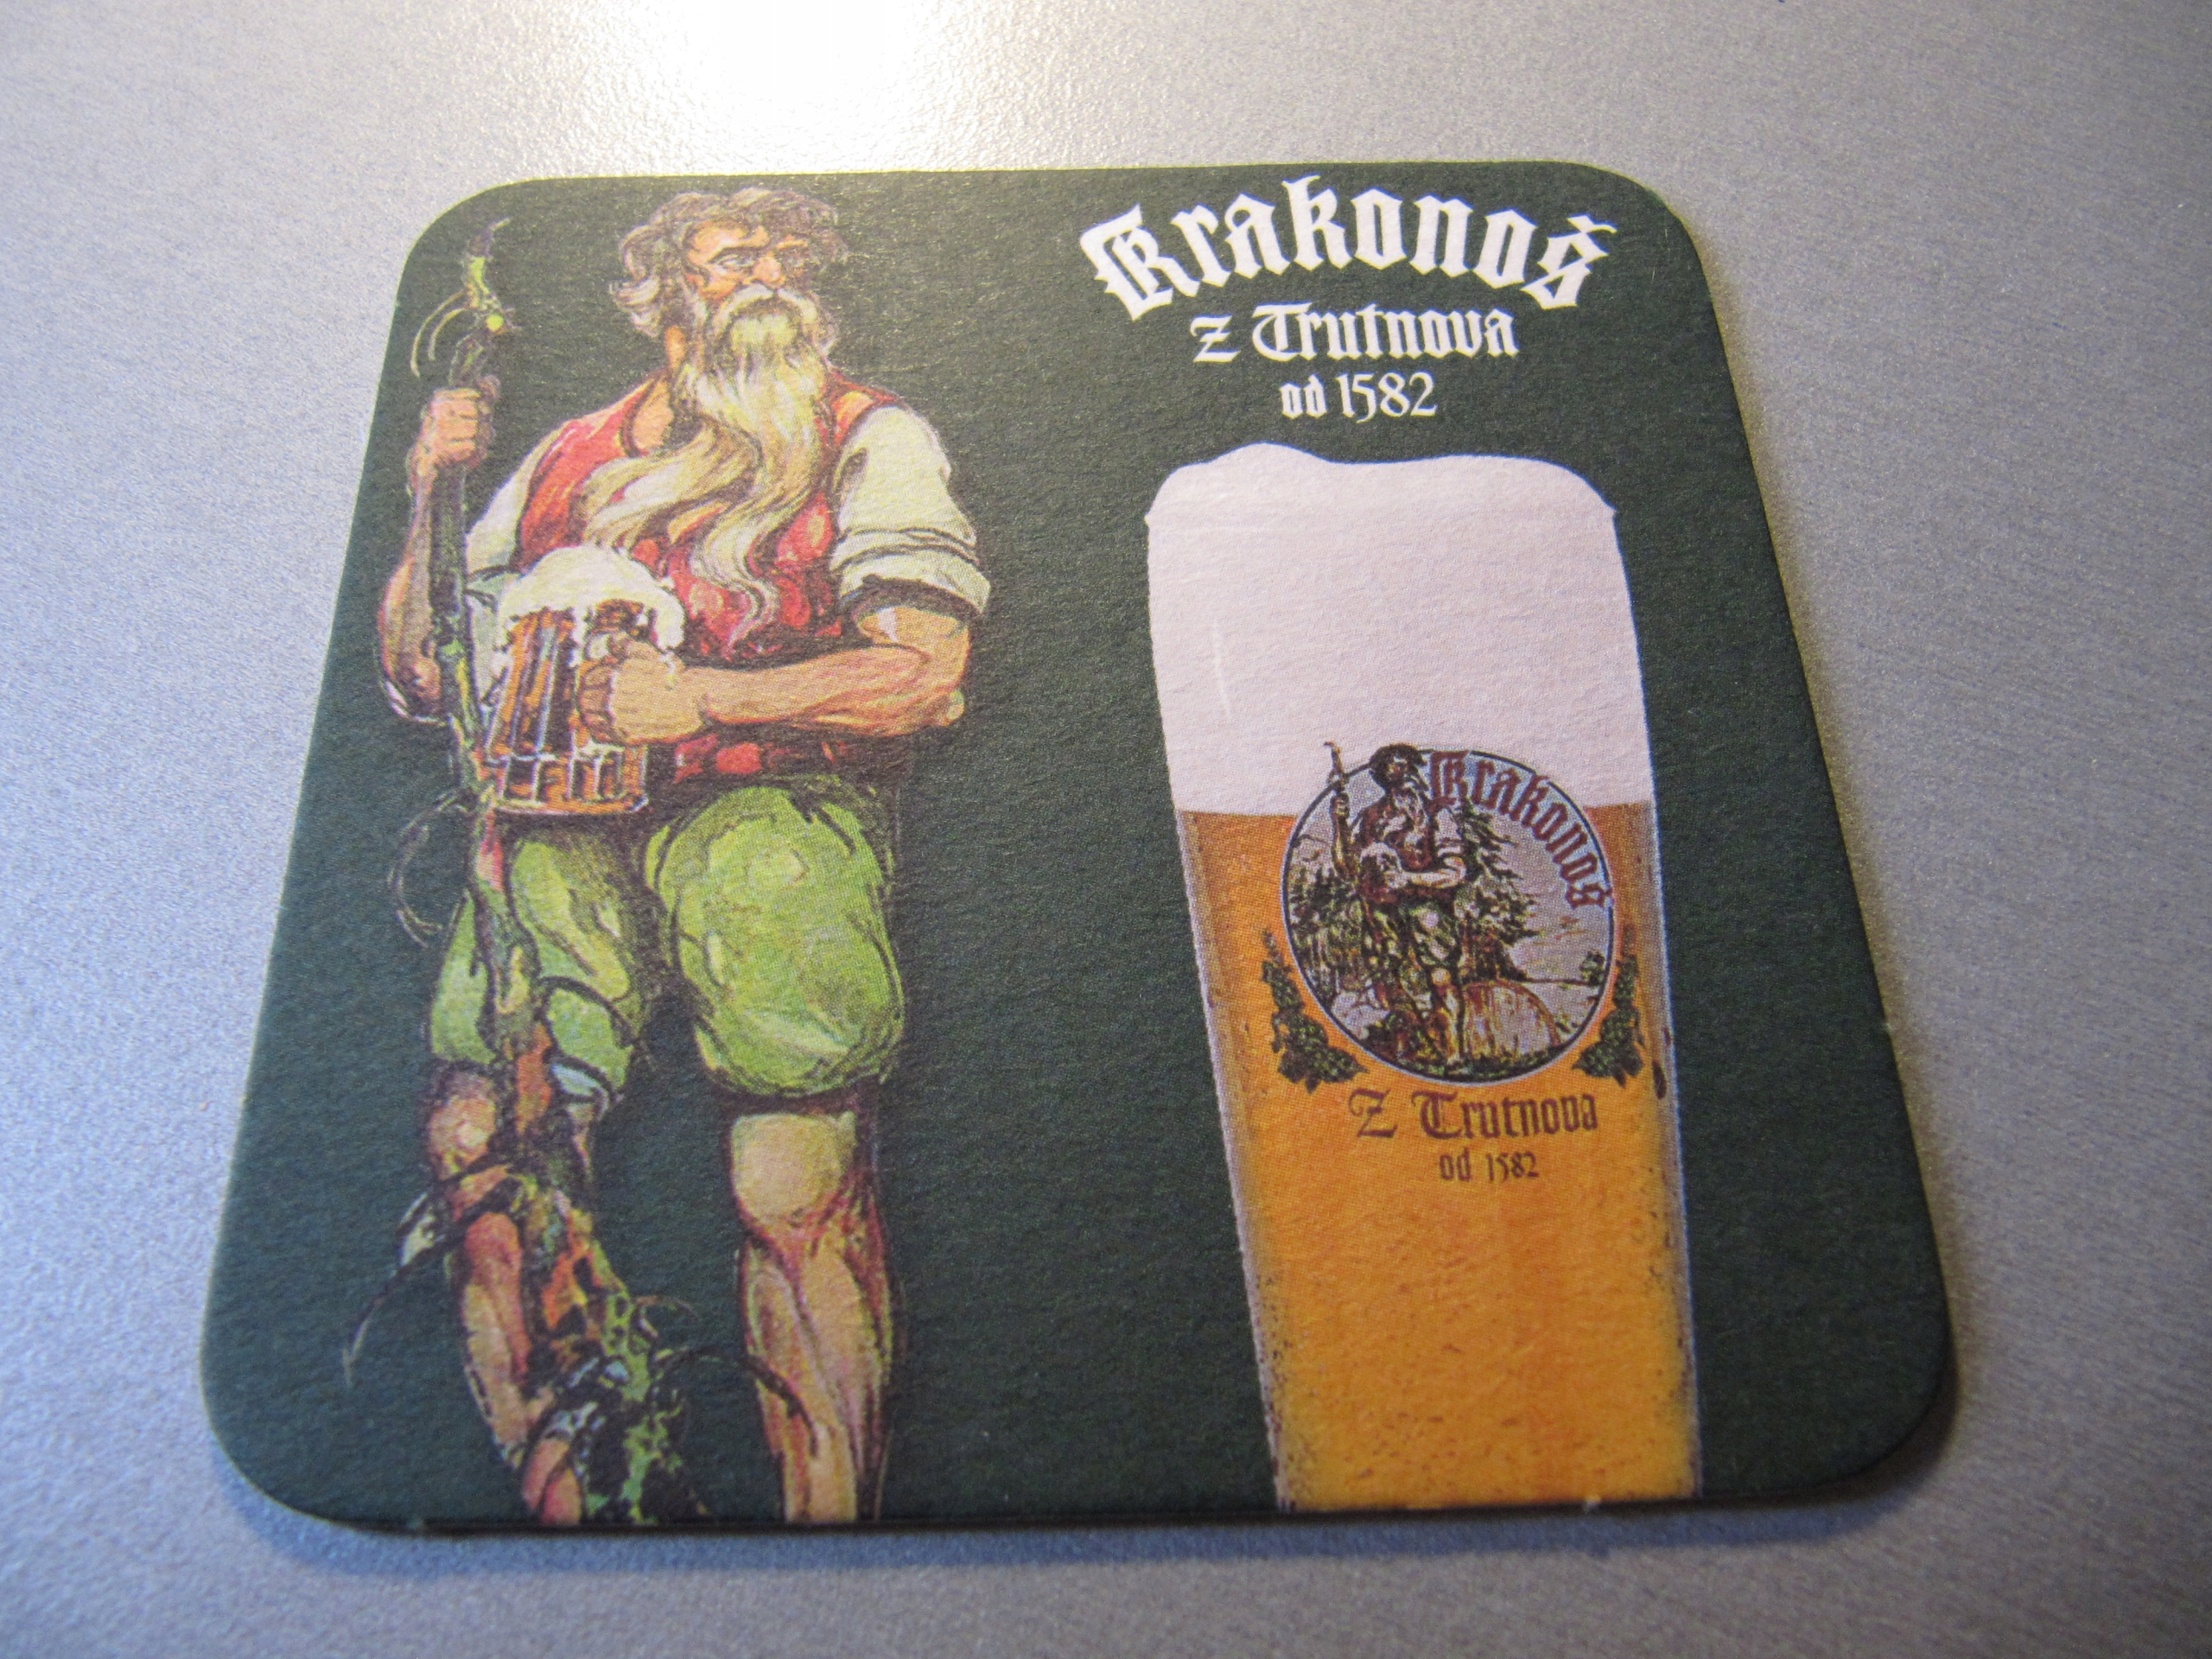 PODSTAWKA PODKŁADKA piwo Krakonos 2000